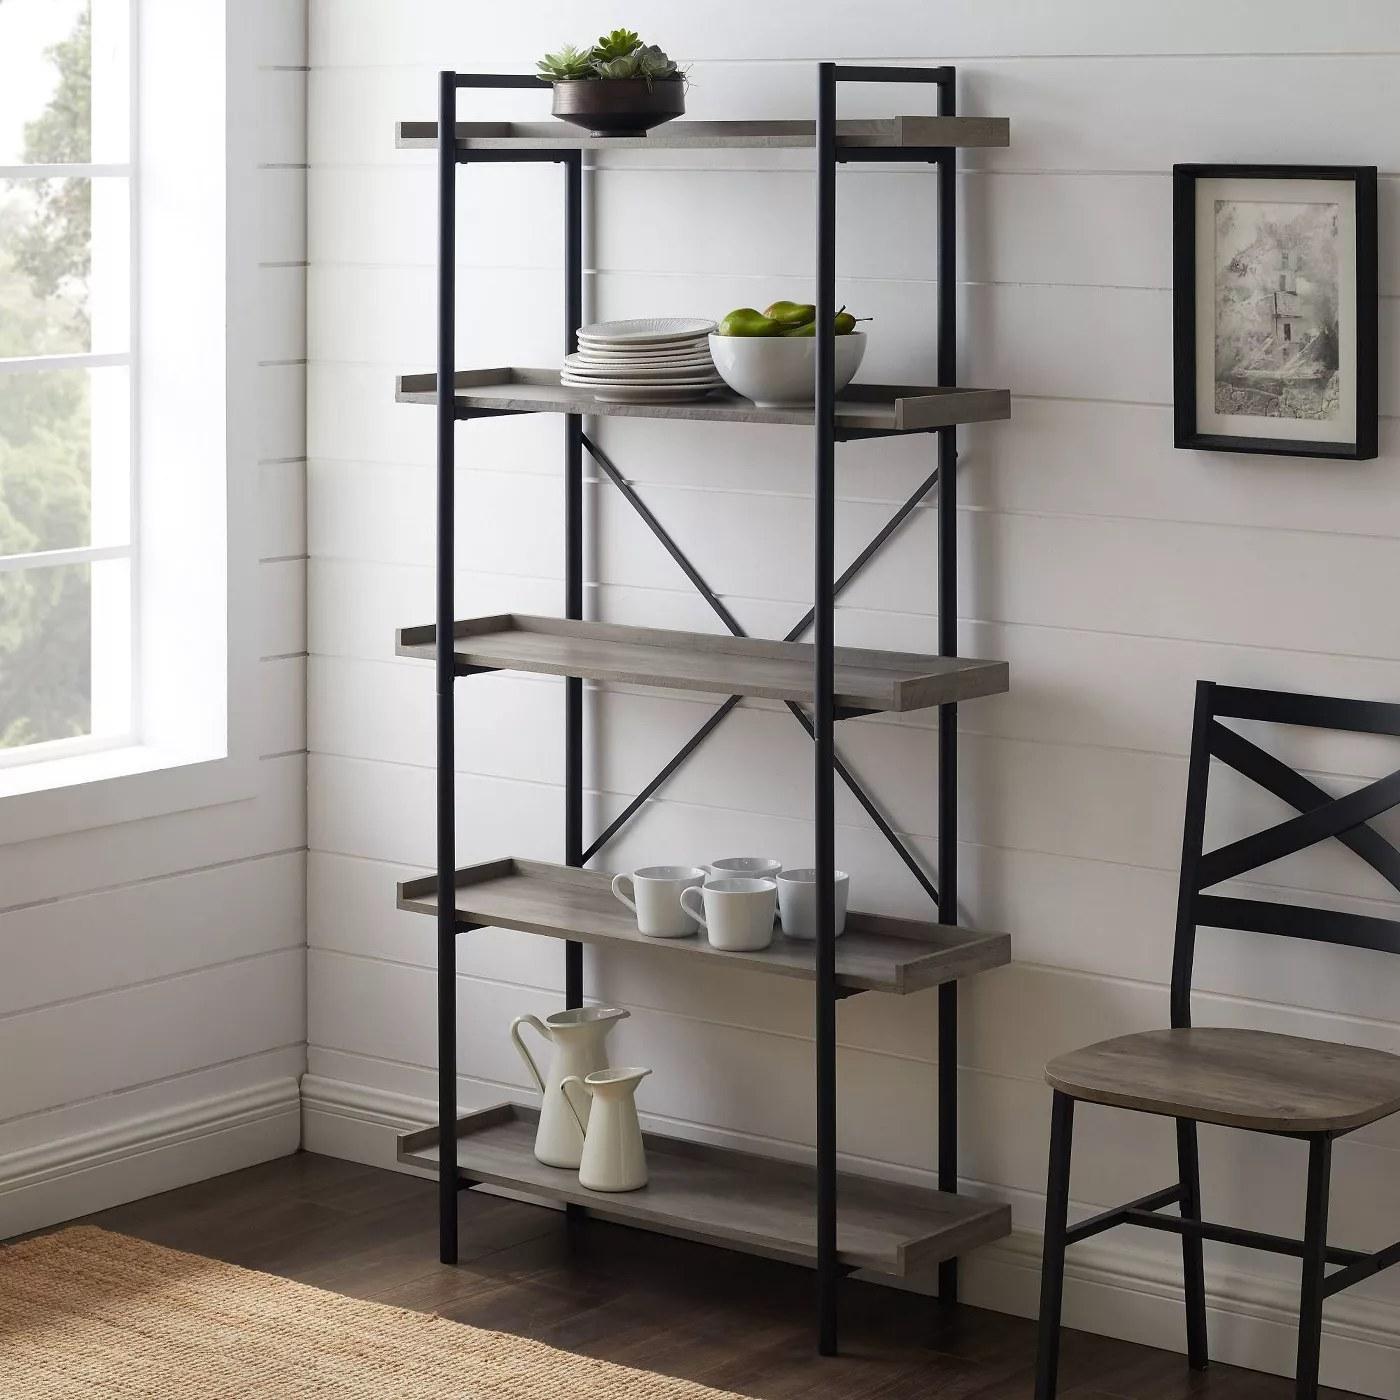 The bookshelf in gray